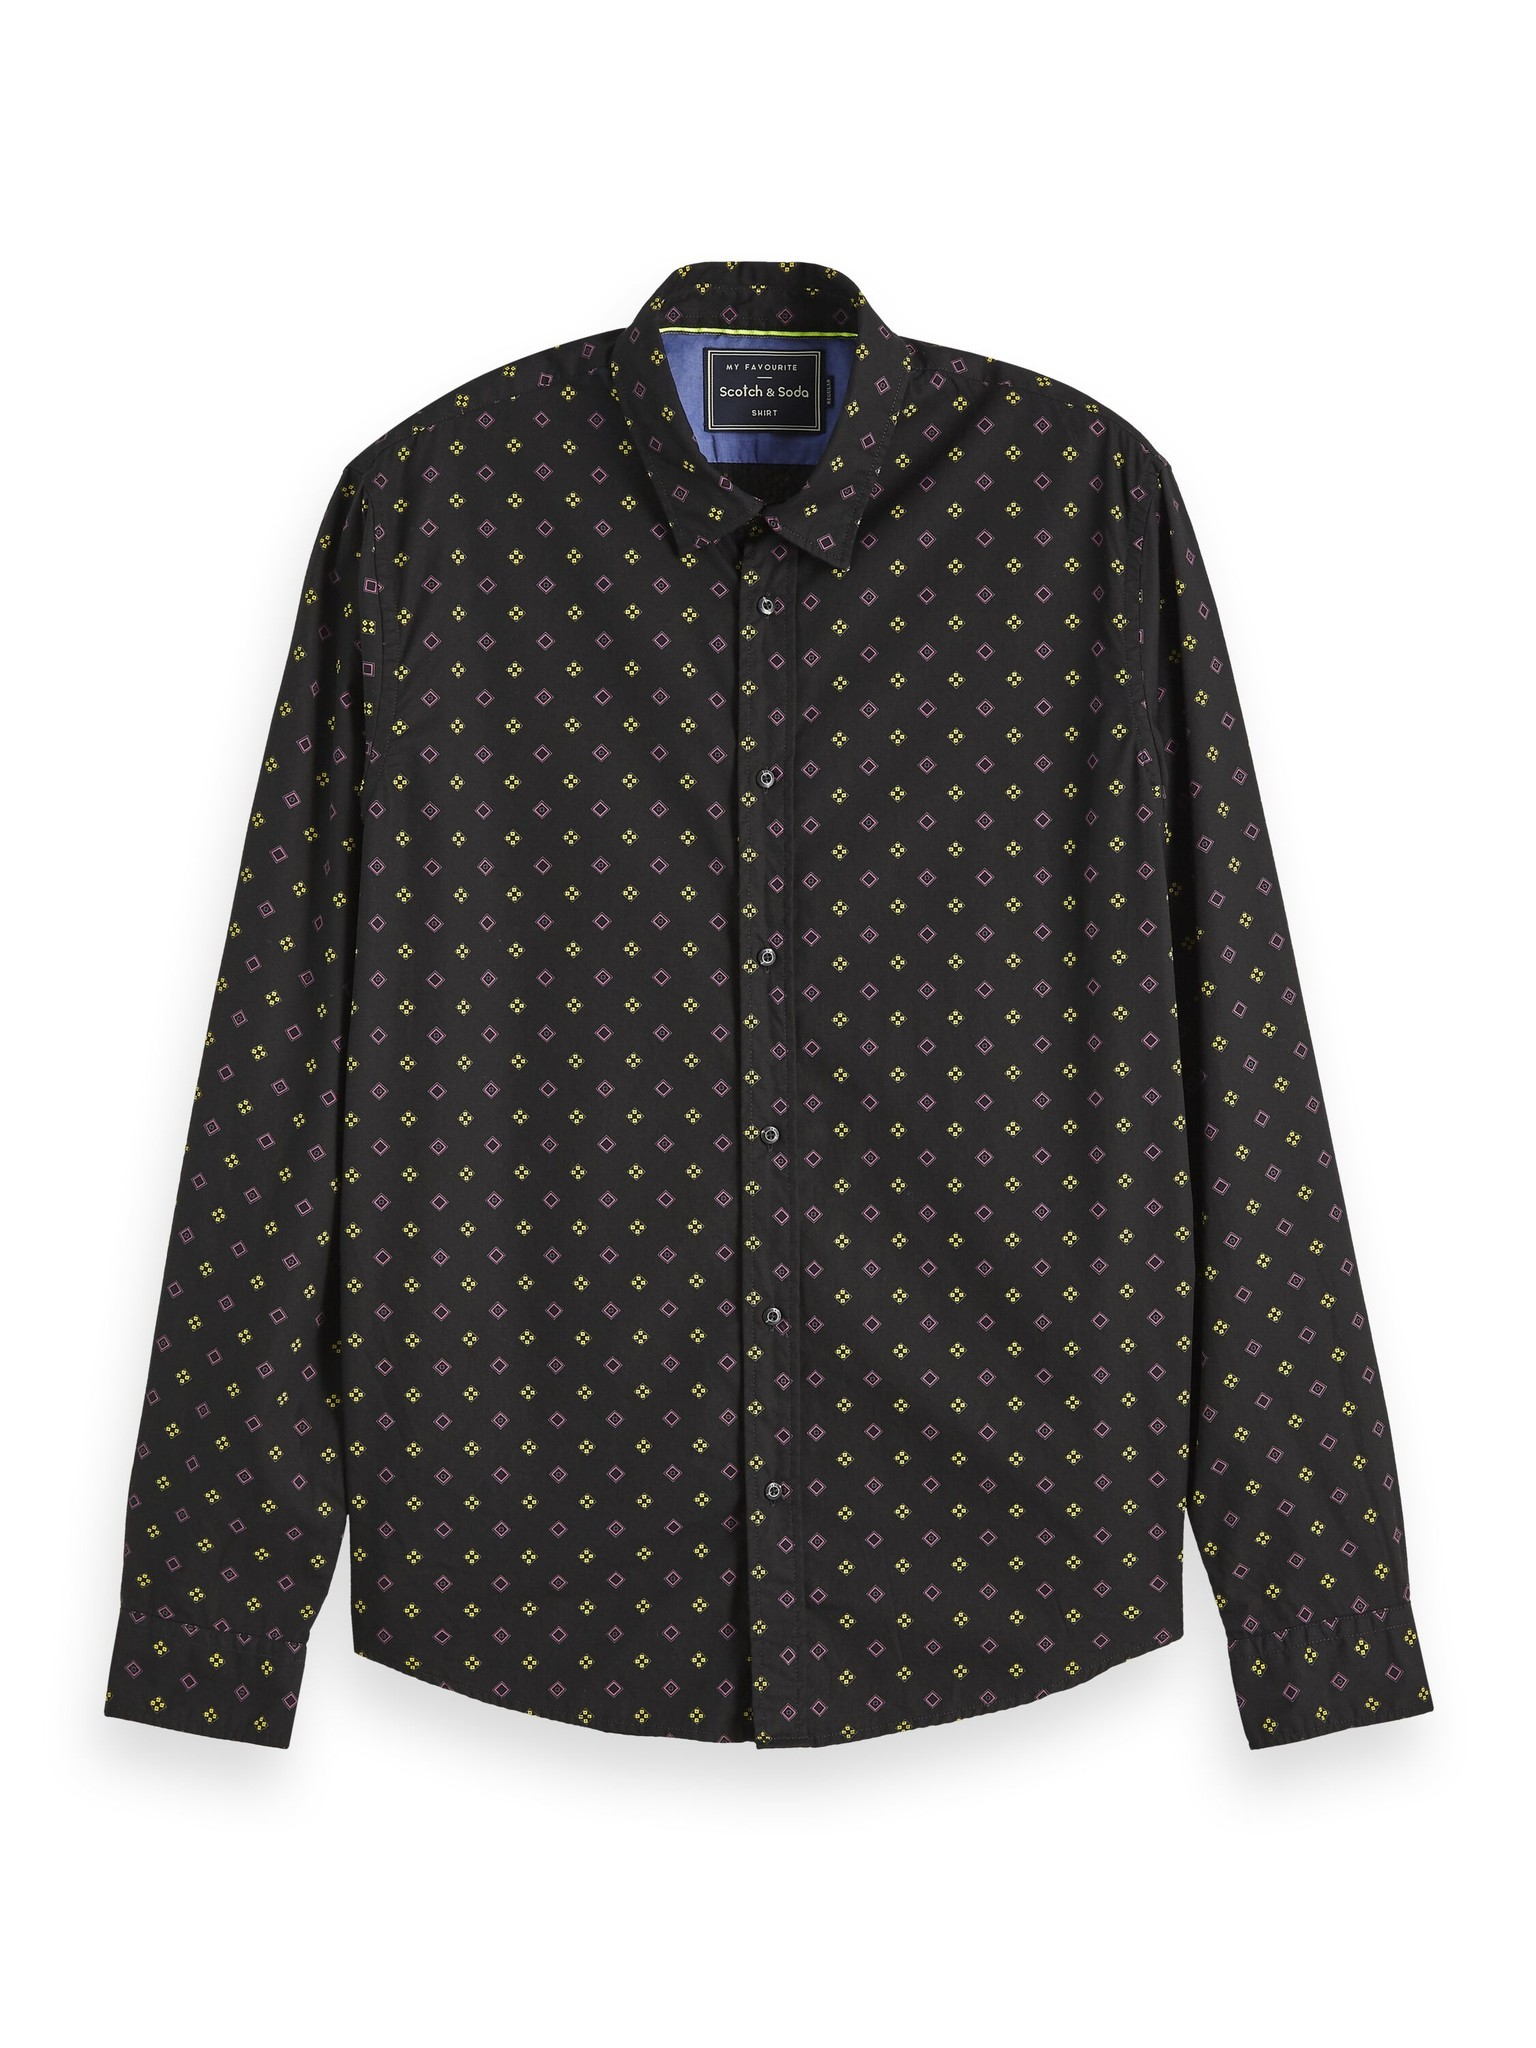 Scotch & Soda All Over Print Regular Fit Black Shirt | 152184